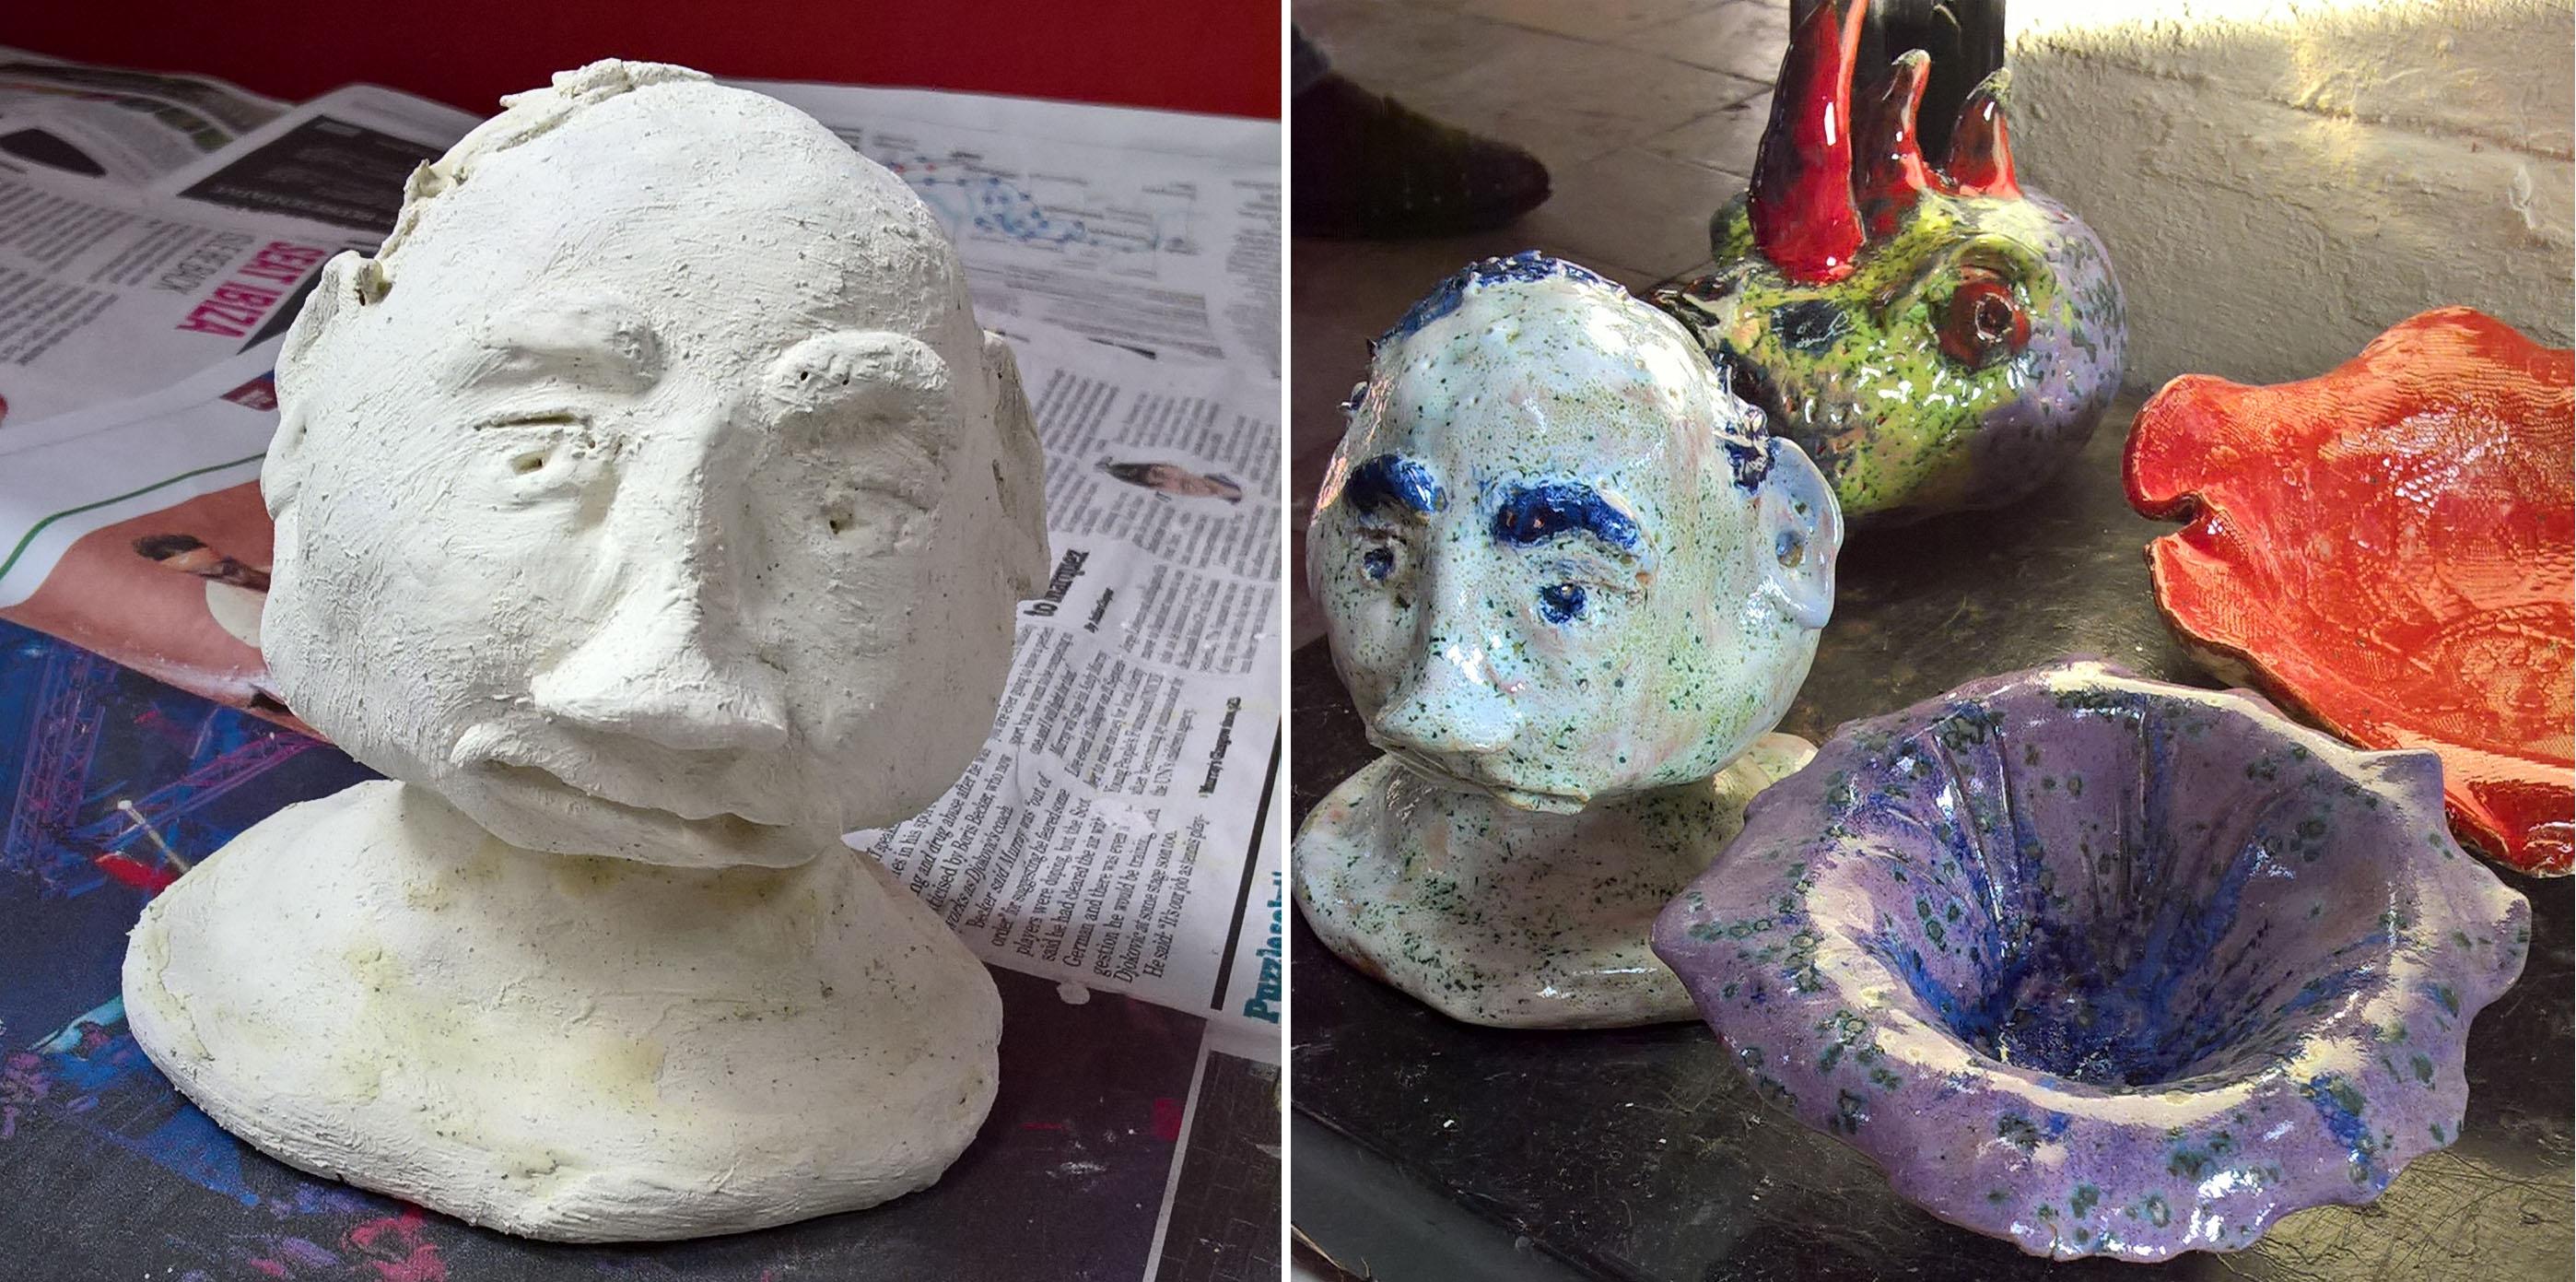 bust-and-bowl-greenspace-carers-class-lisa-shambrook-2016